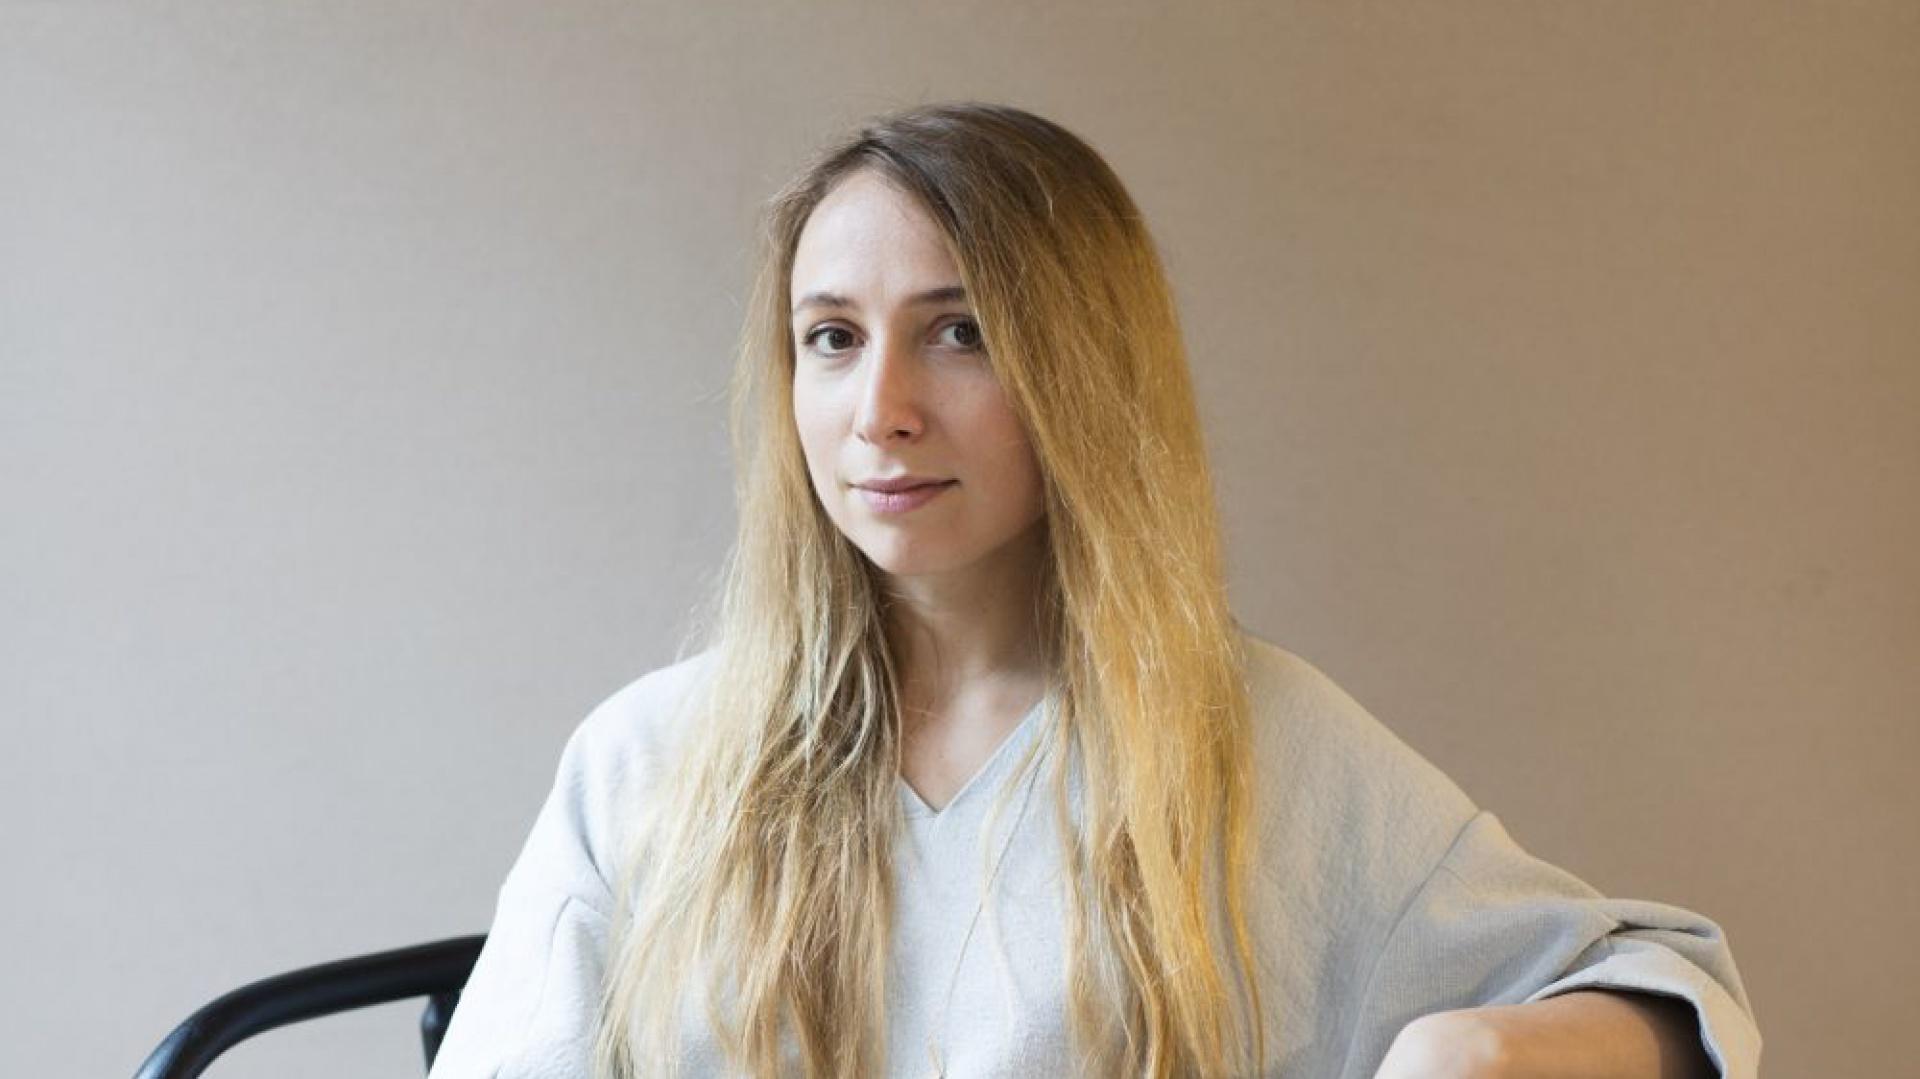 Maja Ganszyniec